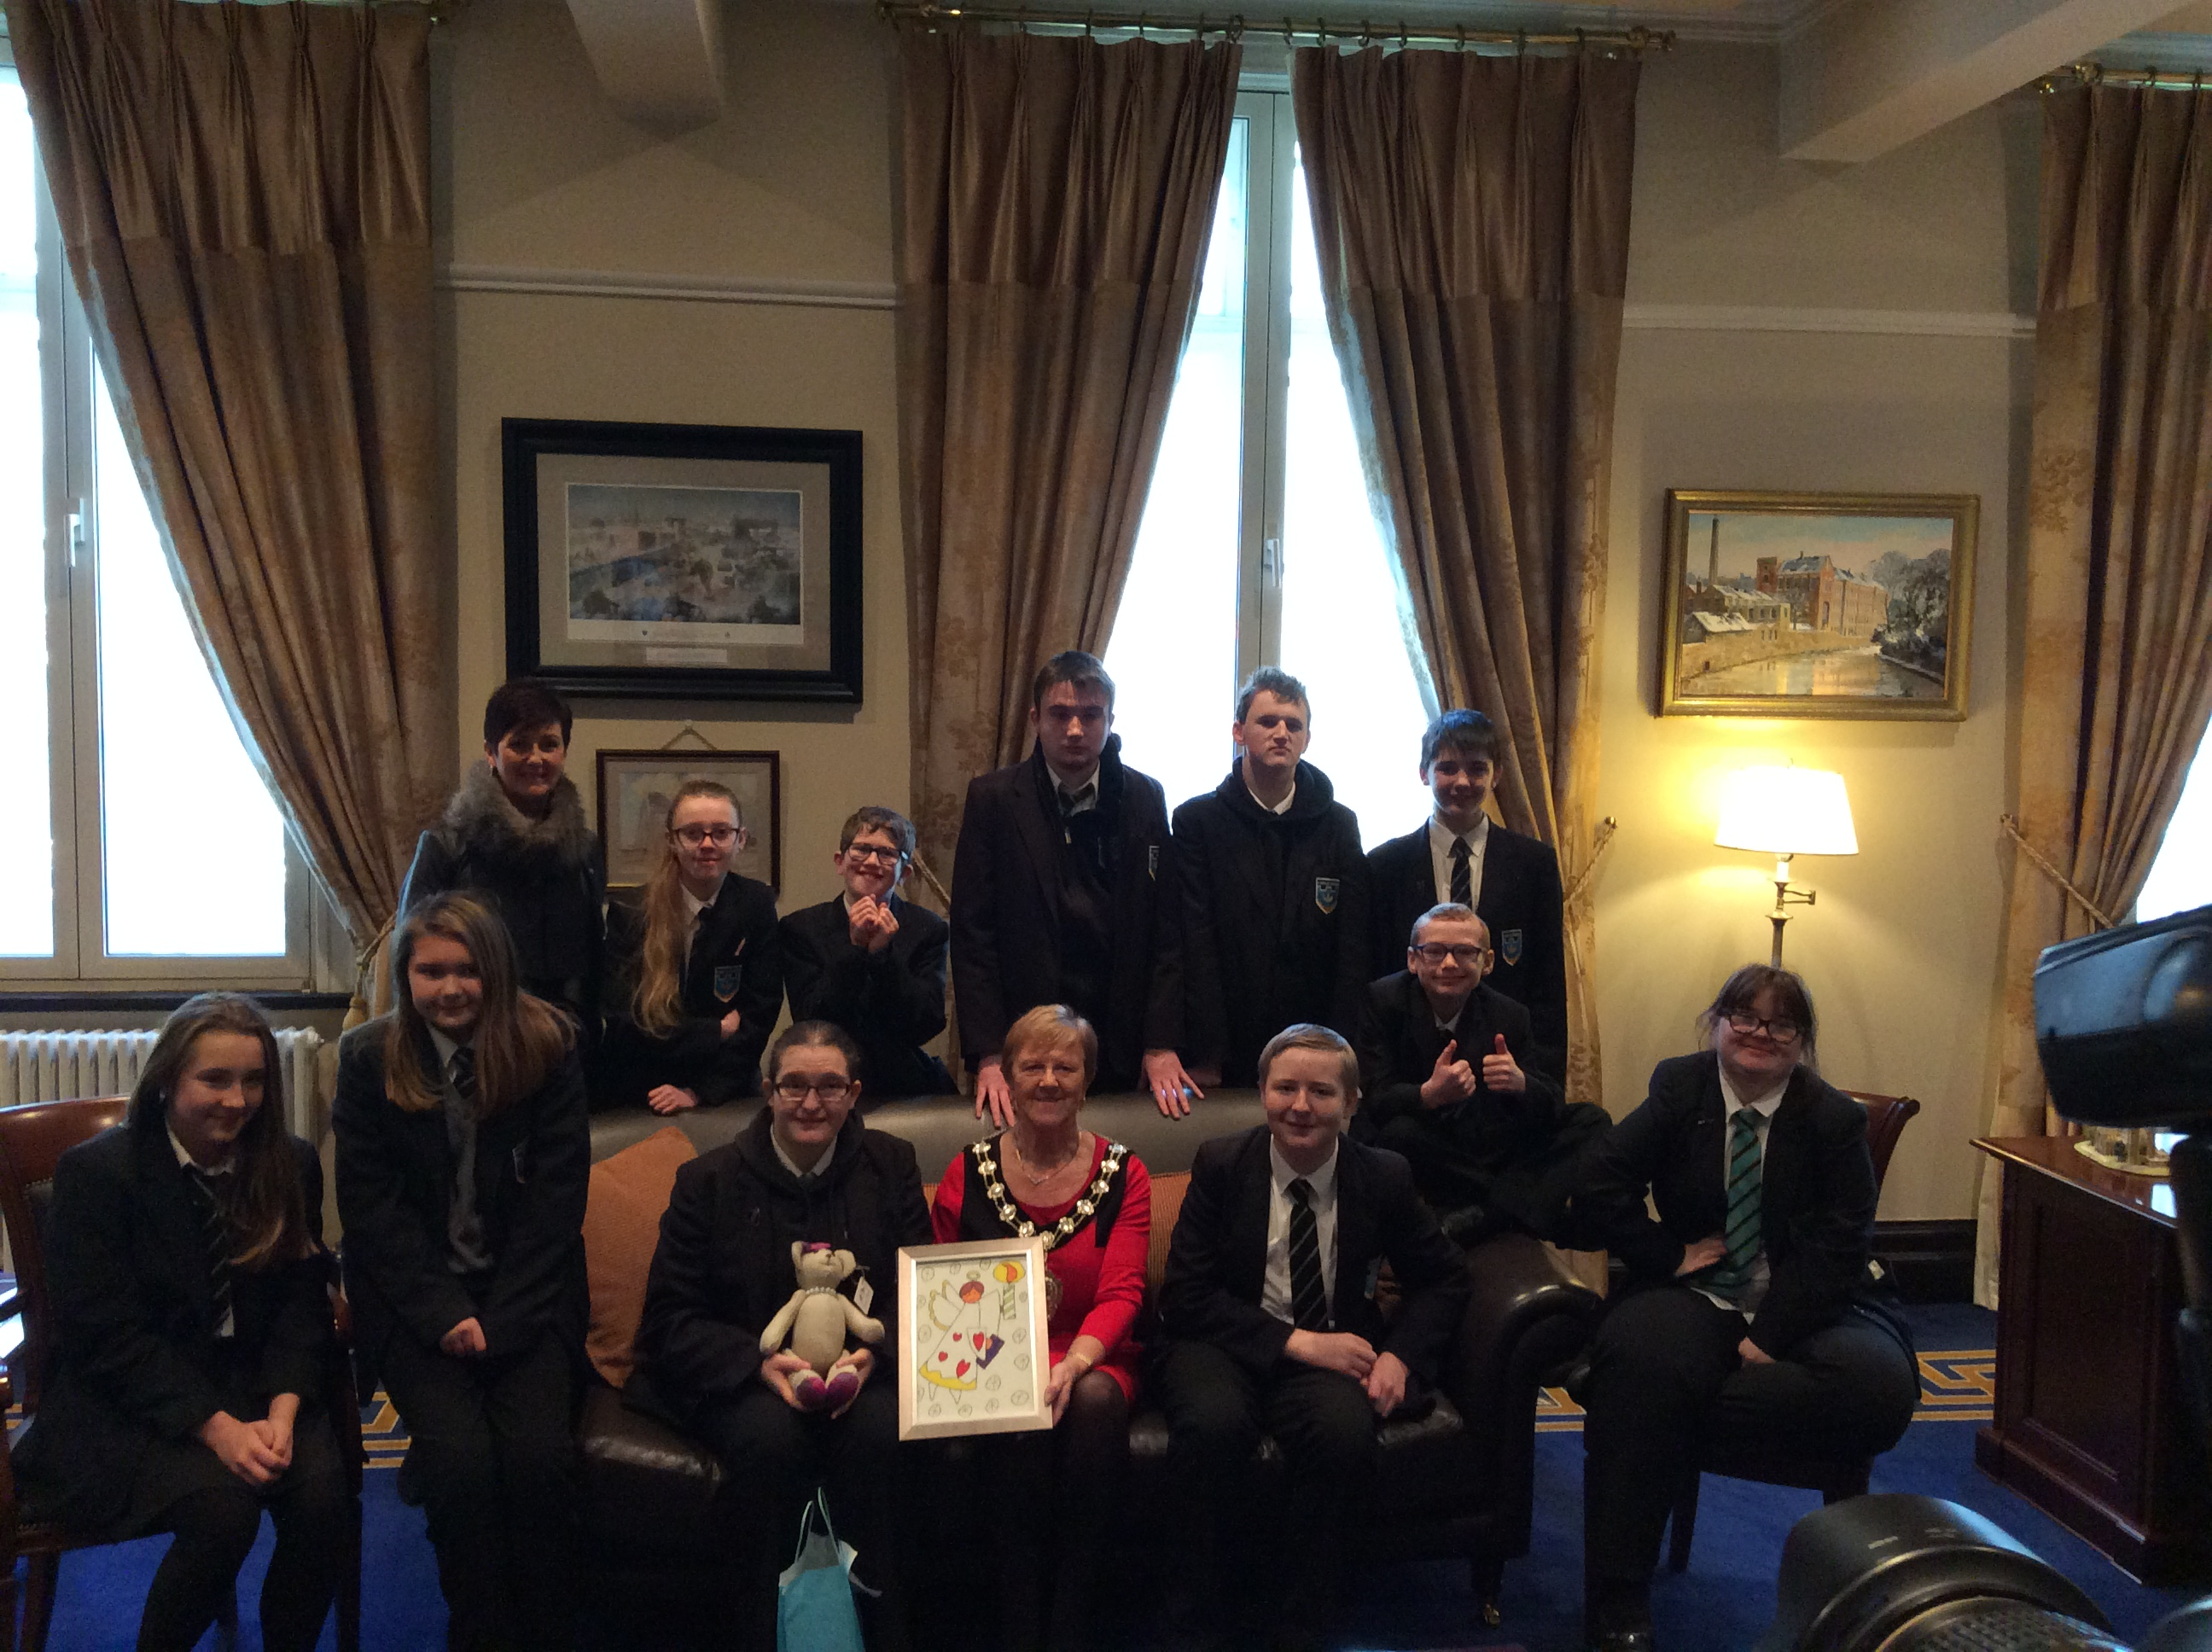 Ballymena Bear Helps Launch Boroughs Christmas Card